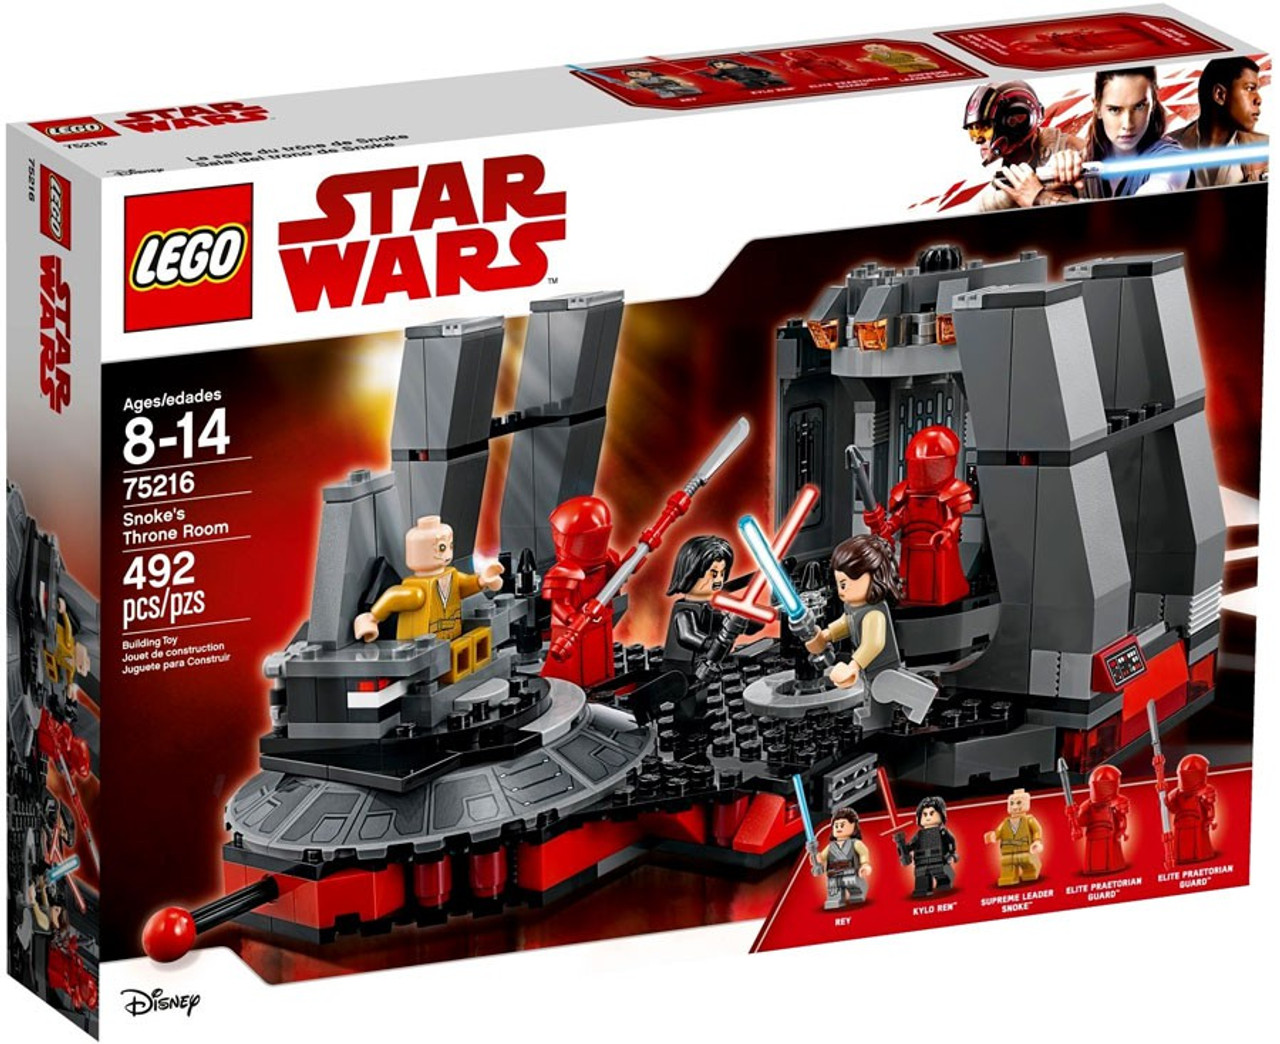 LEGO STAR WARS Praetorian Guard  MINIFIG new from Lego set #75216 New